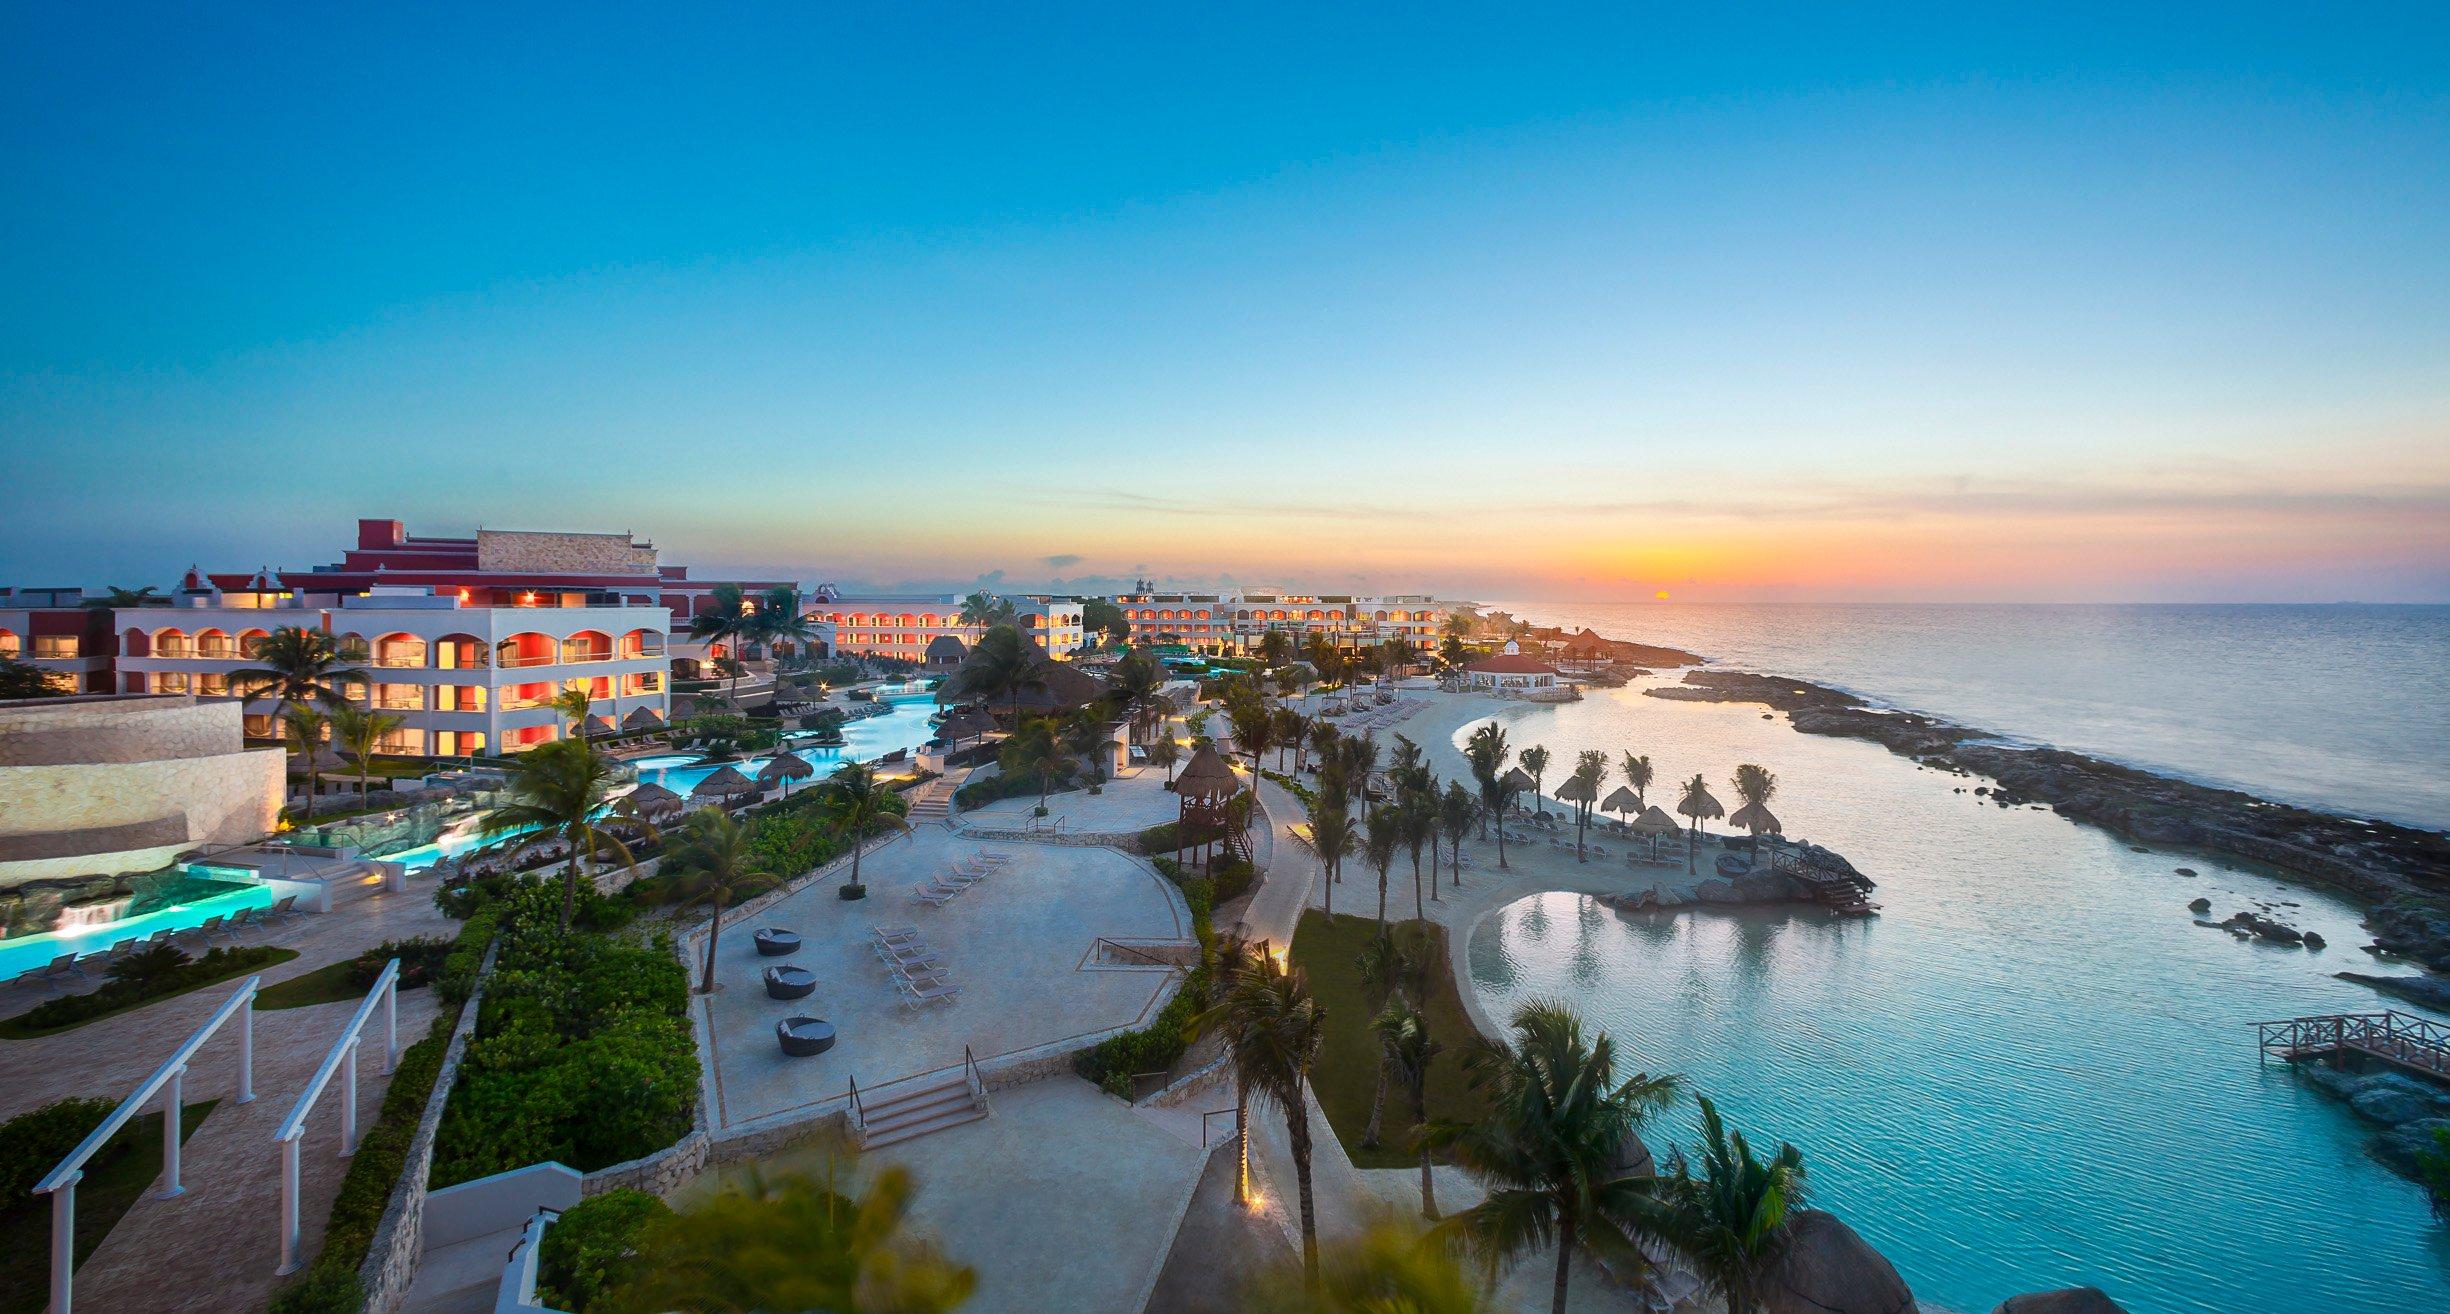 hard-rock-hotel-riviera-maya-hacienda-1.jpg